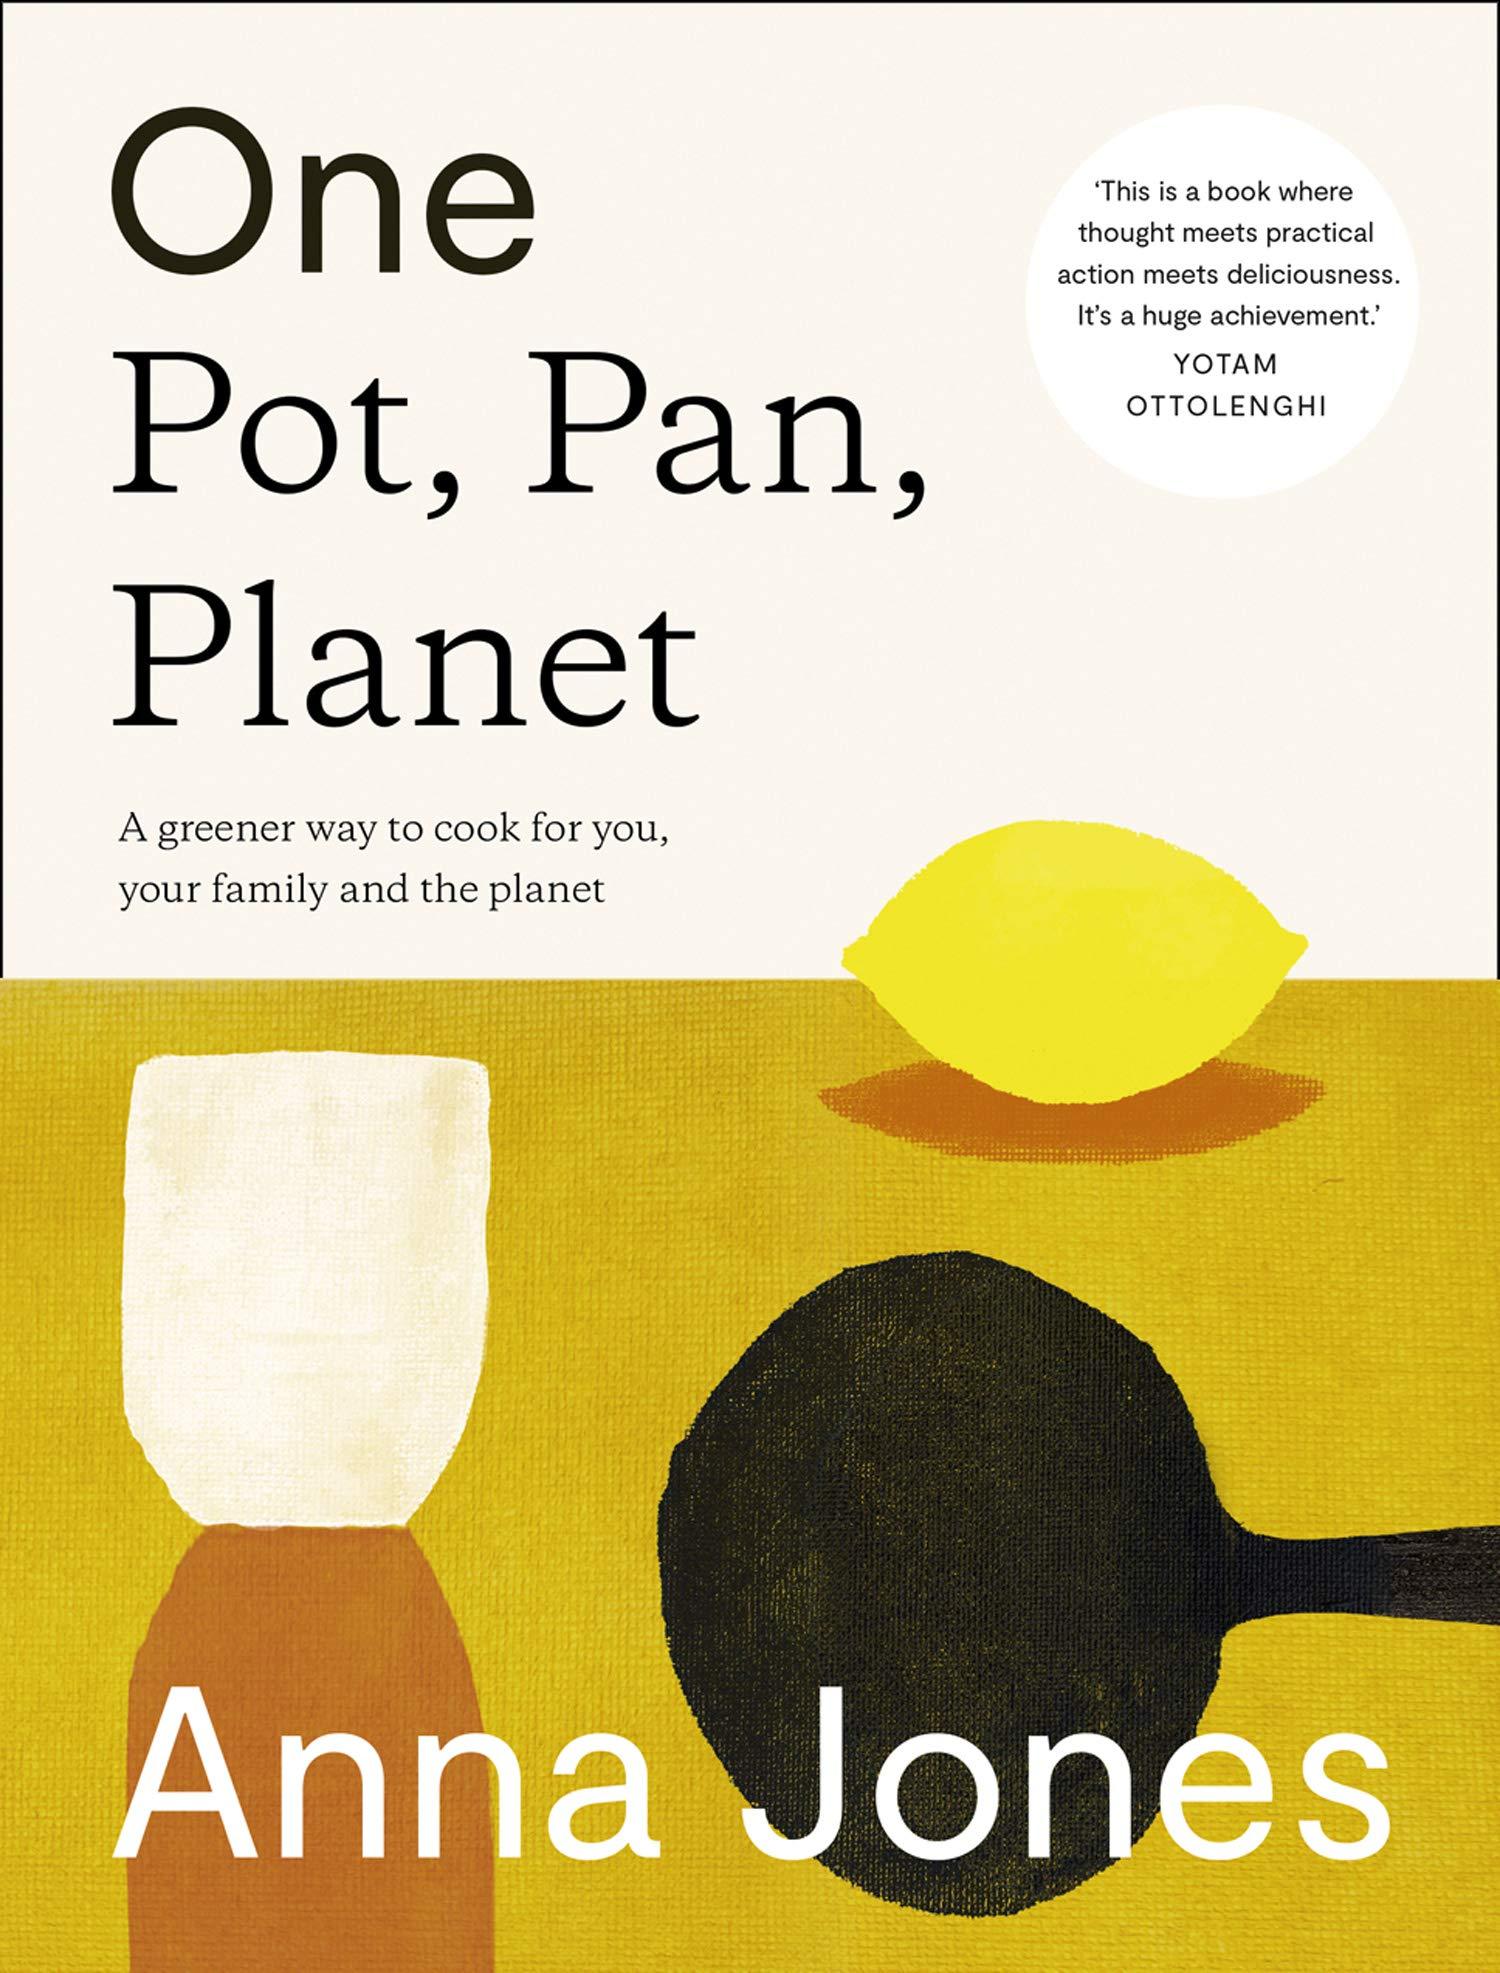 One Pot, Pan, Planet by Anna Jones